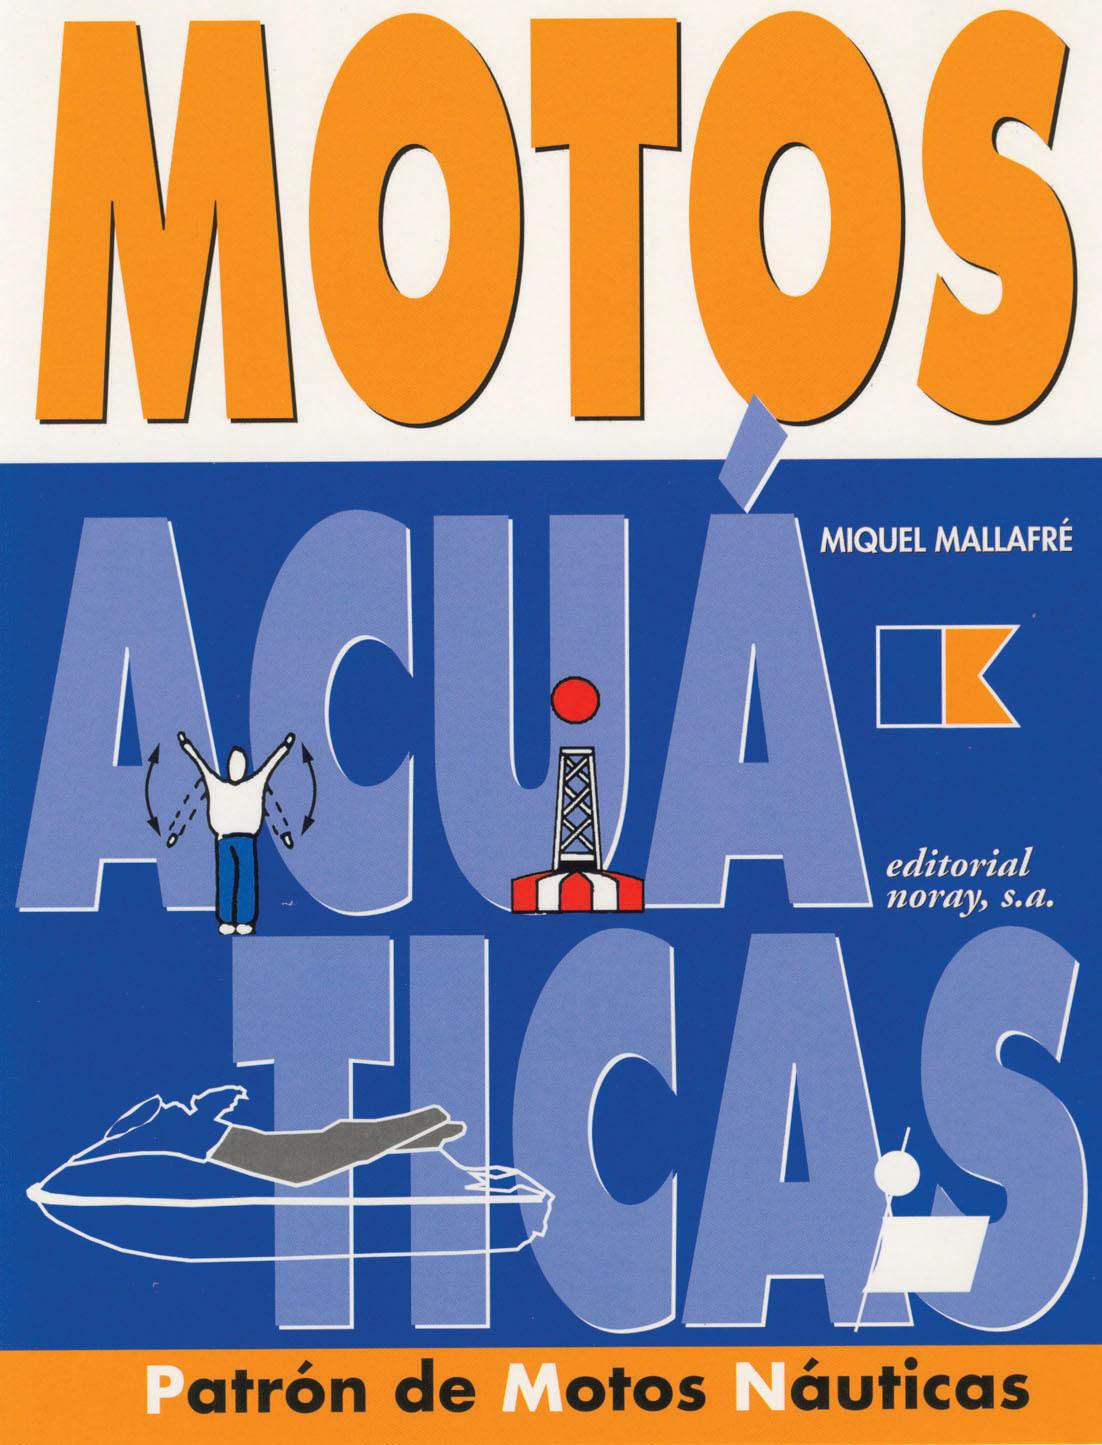 PATRÓN DE MOTOS ACUÁTICAS